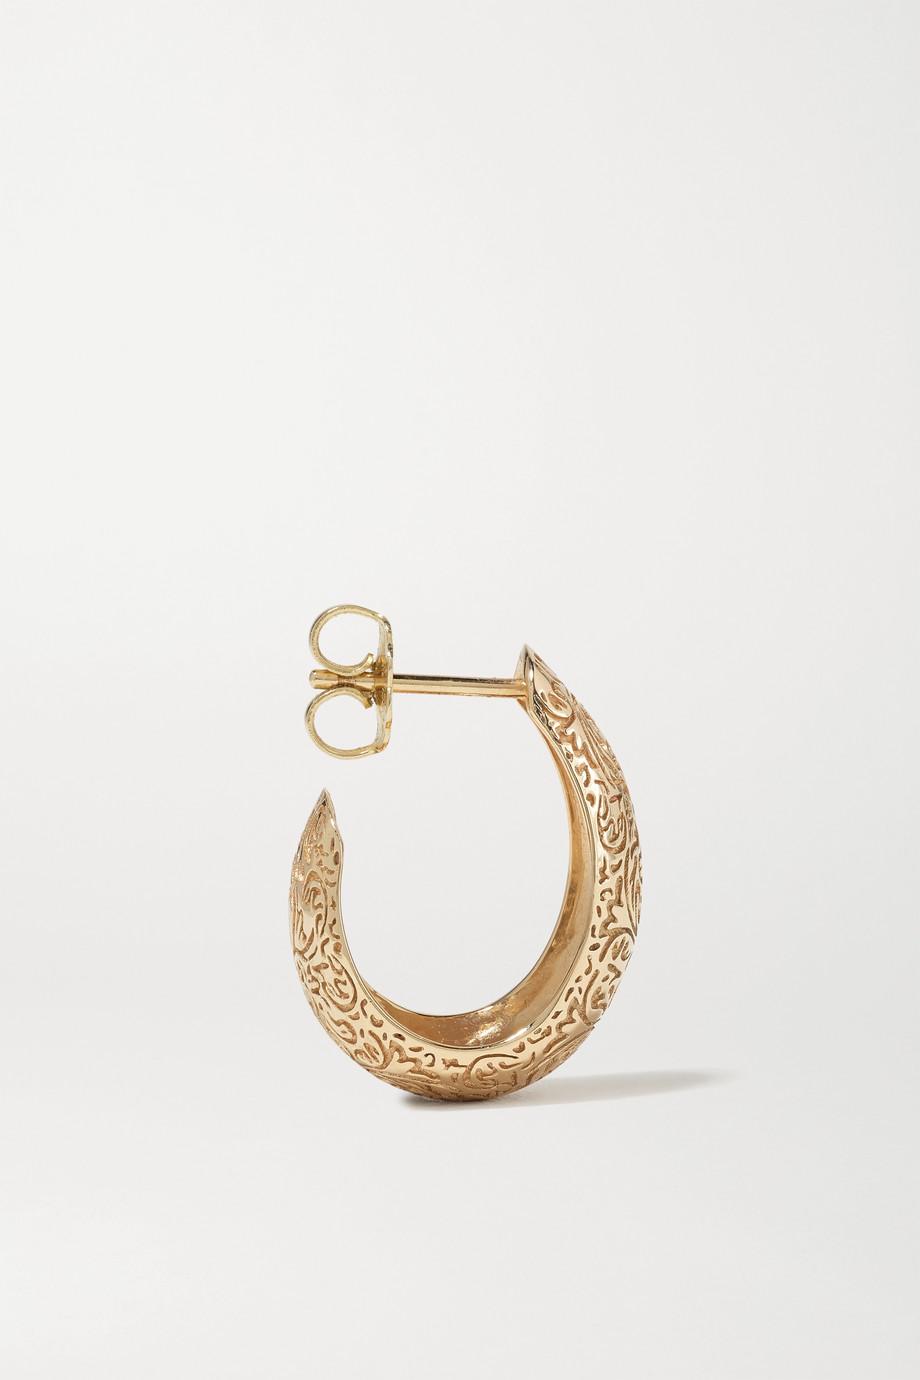 Larkspur & Hawk Illustrated Arbor Bombay 14-karat gold hoop earrings